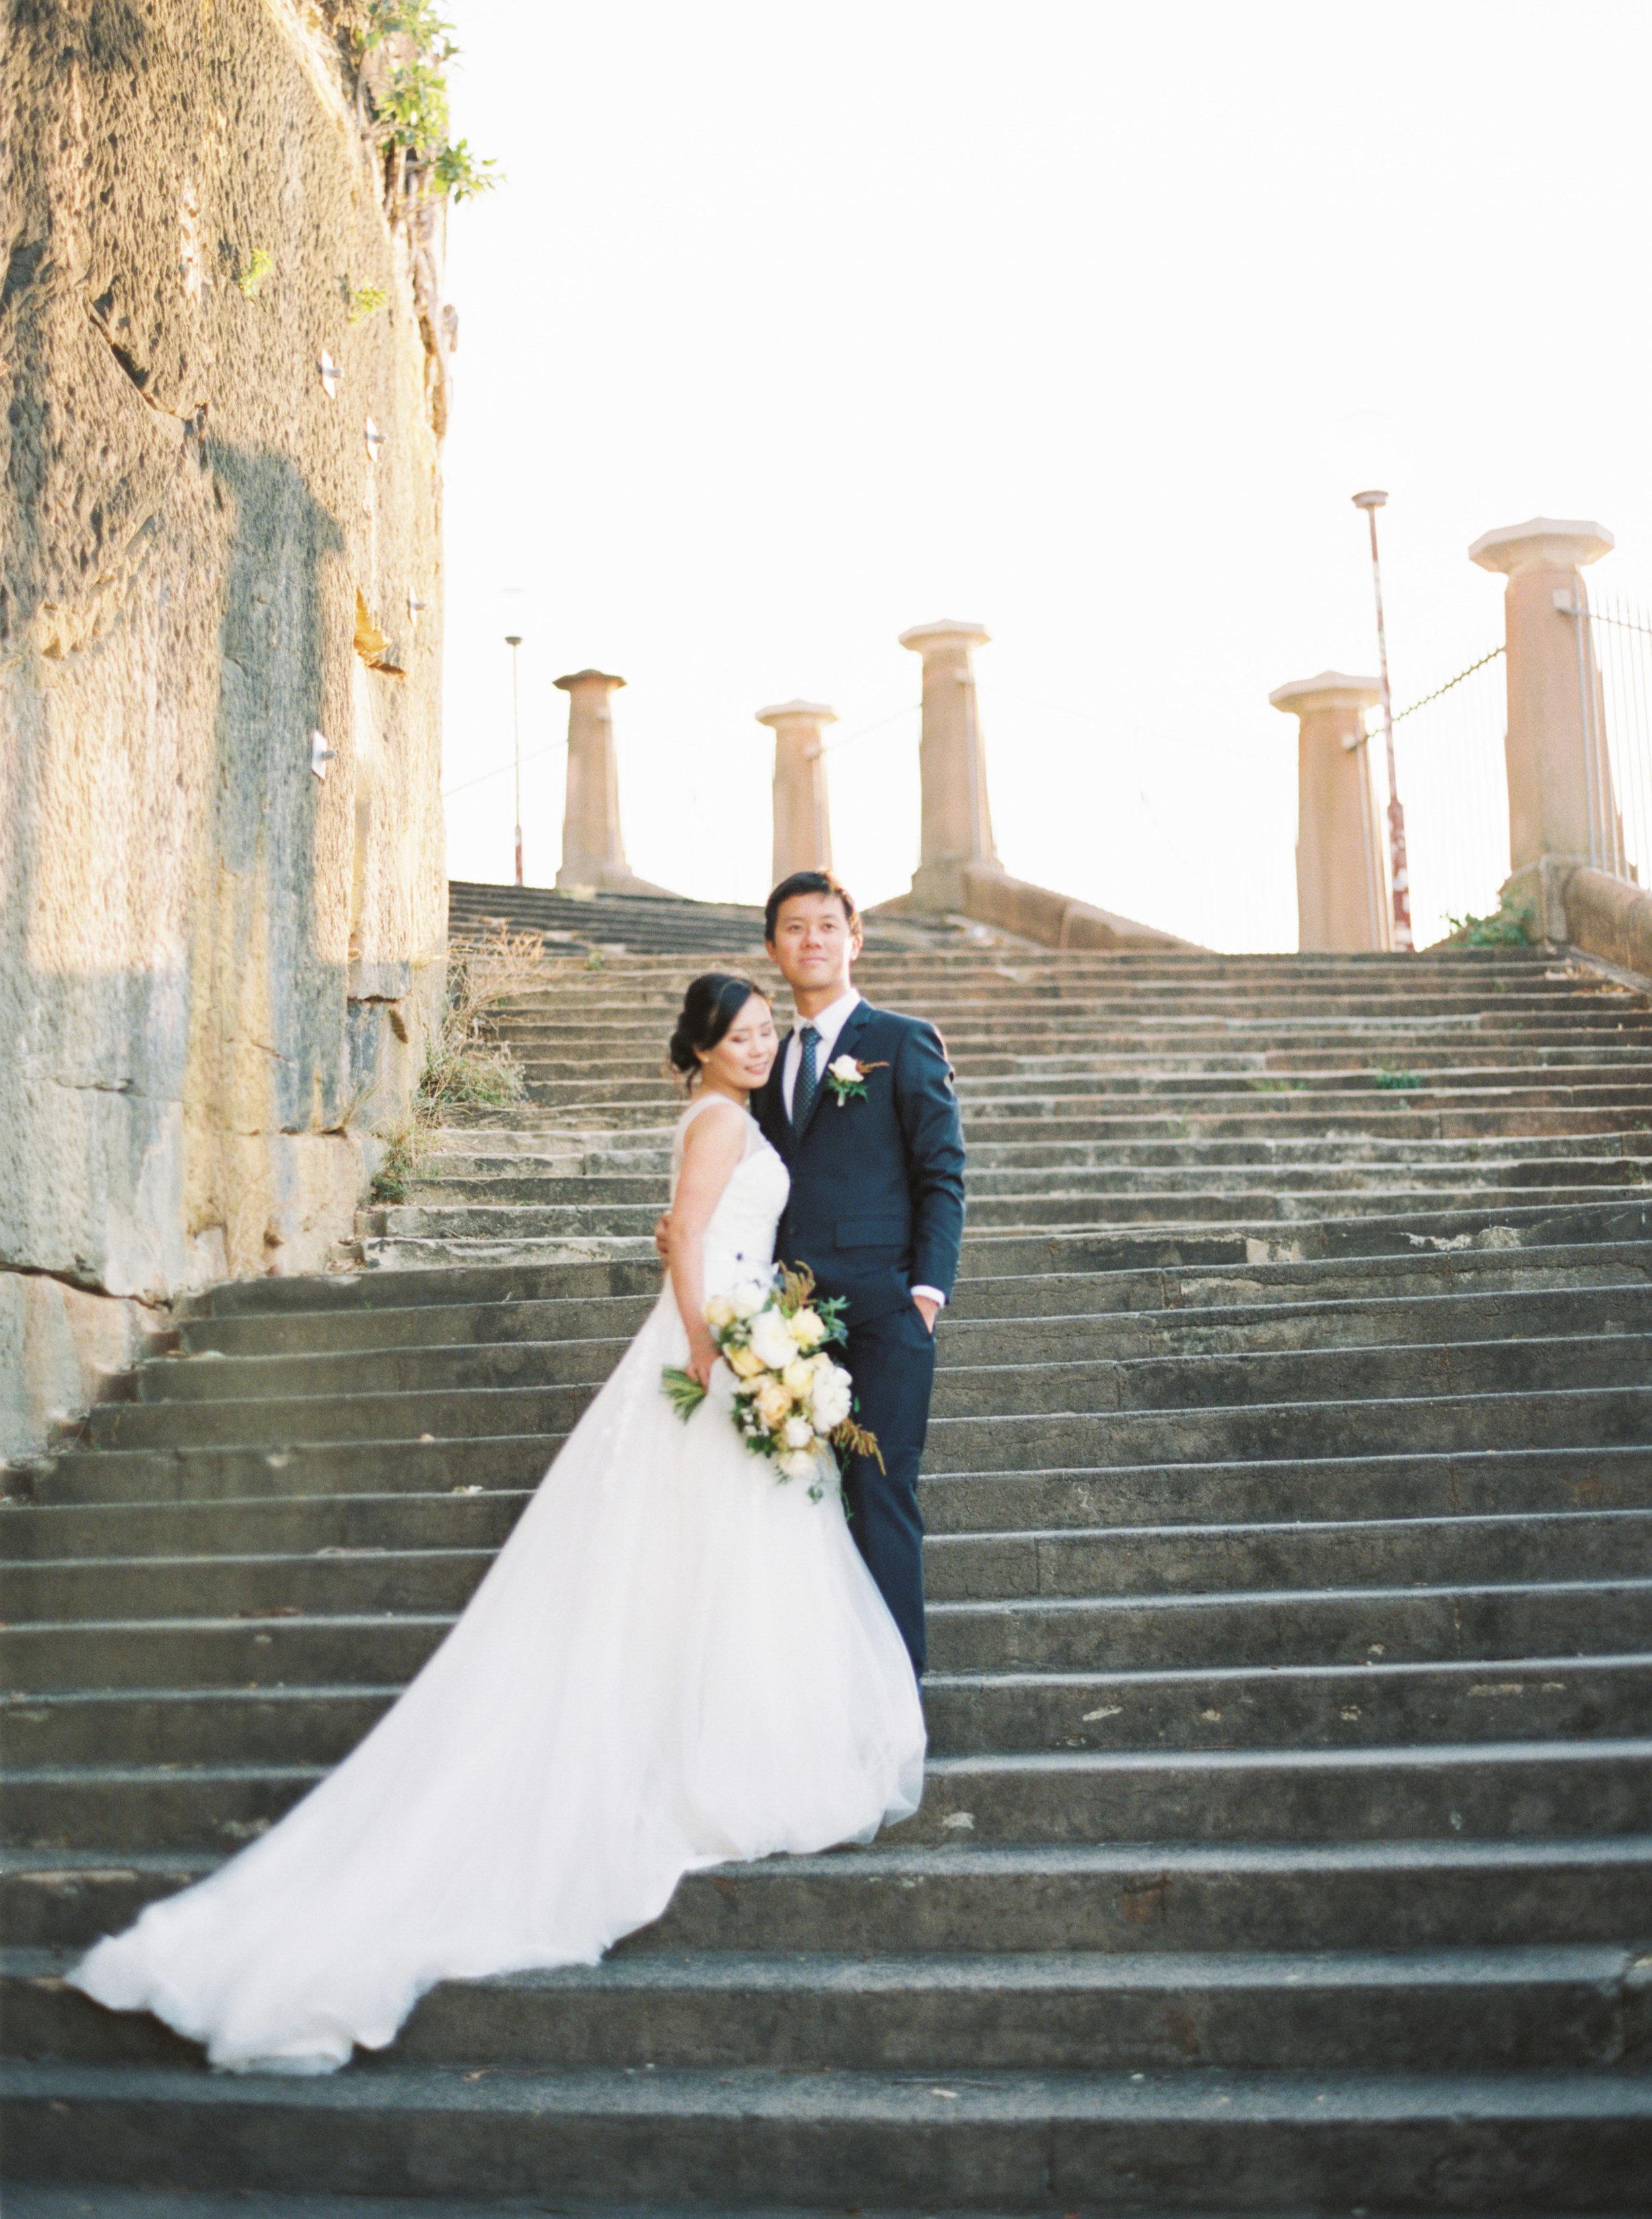 00011- Australia Sydney Wedding Photographer Sheri McMahon.jpg